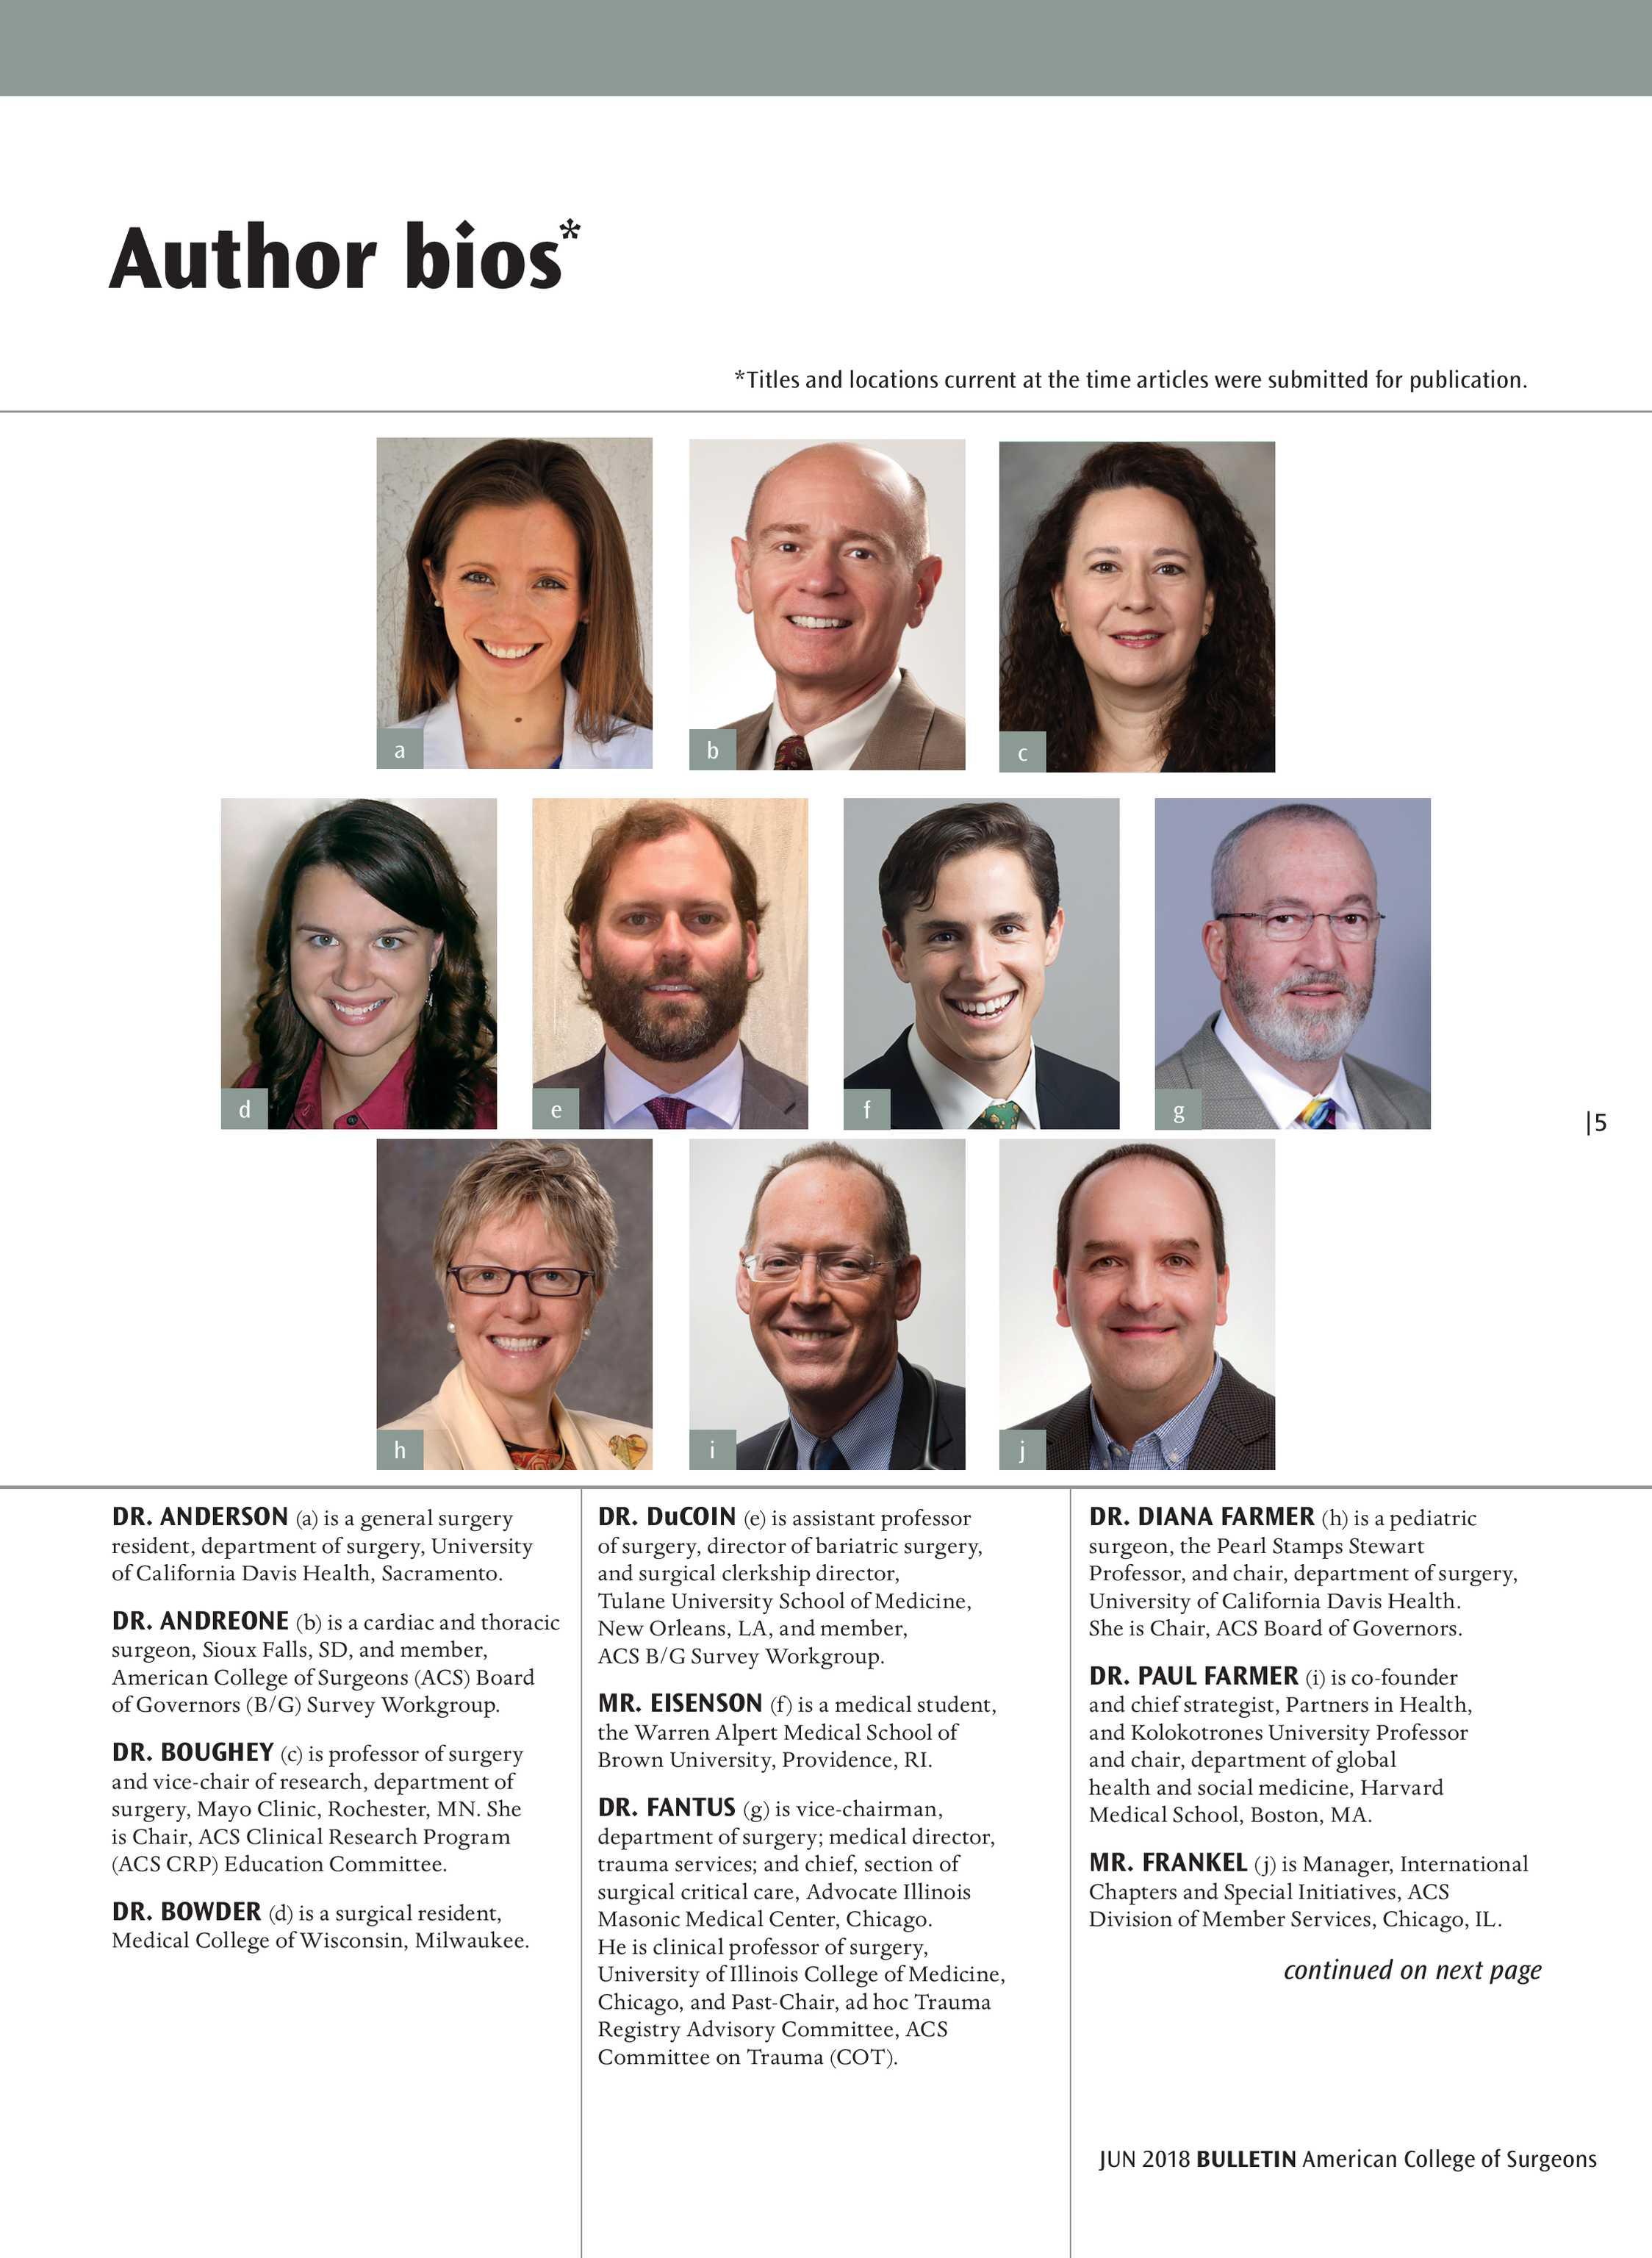 ACS Bulletin - June 2018 - page 4